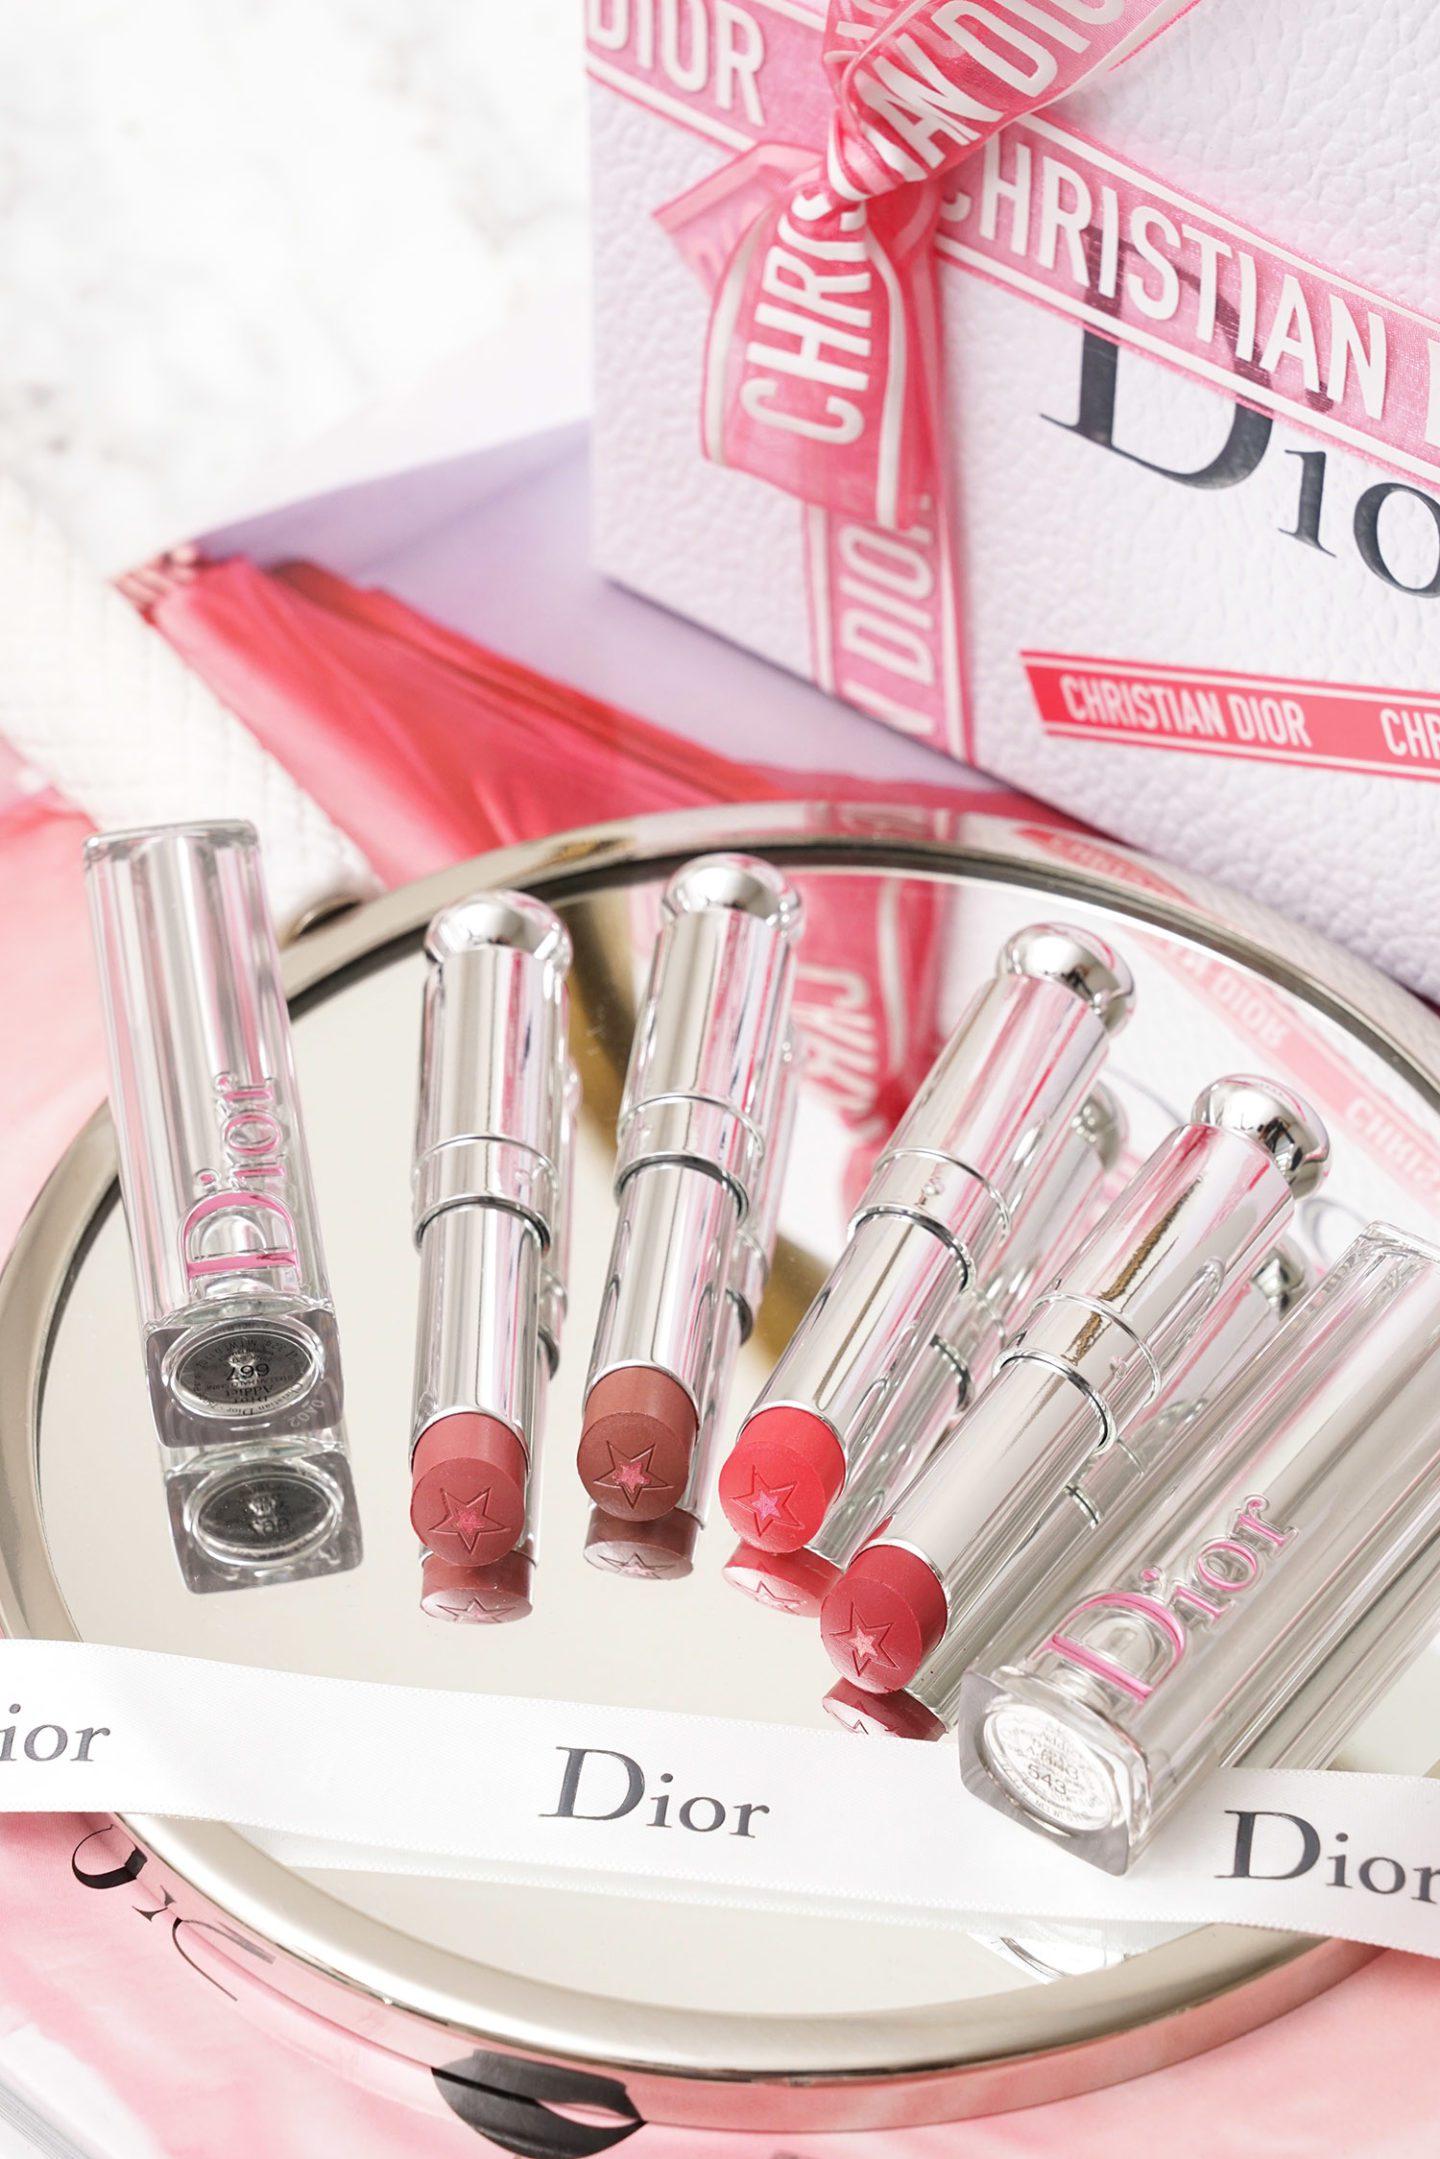 Dior Addict Stellar Halo Shine Lipstick review